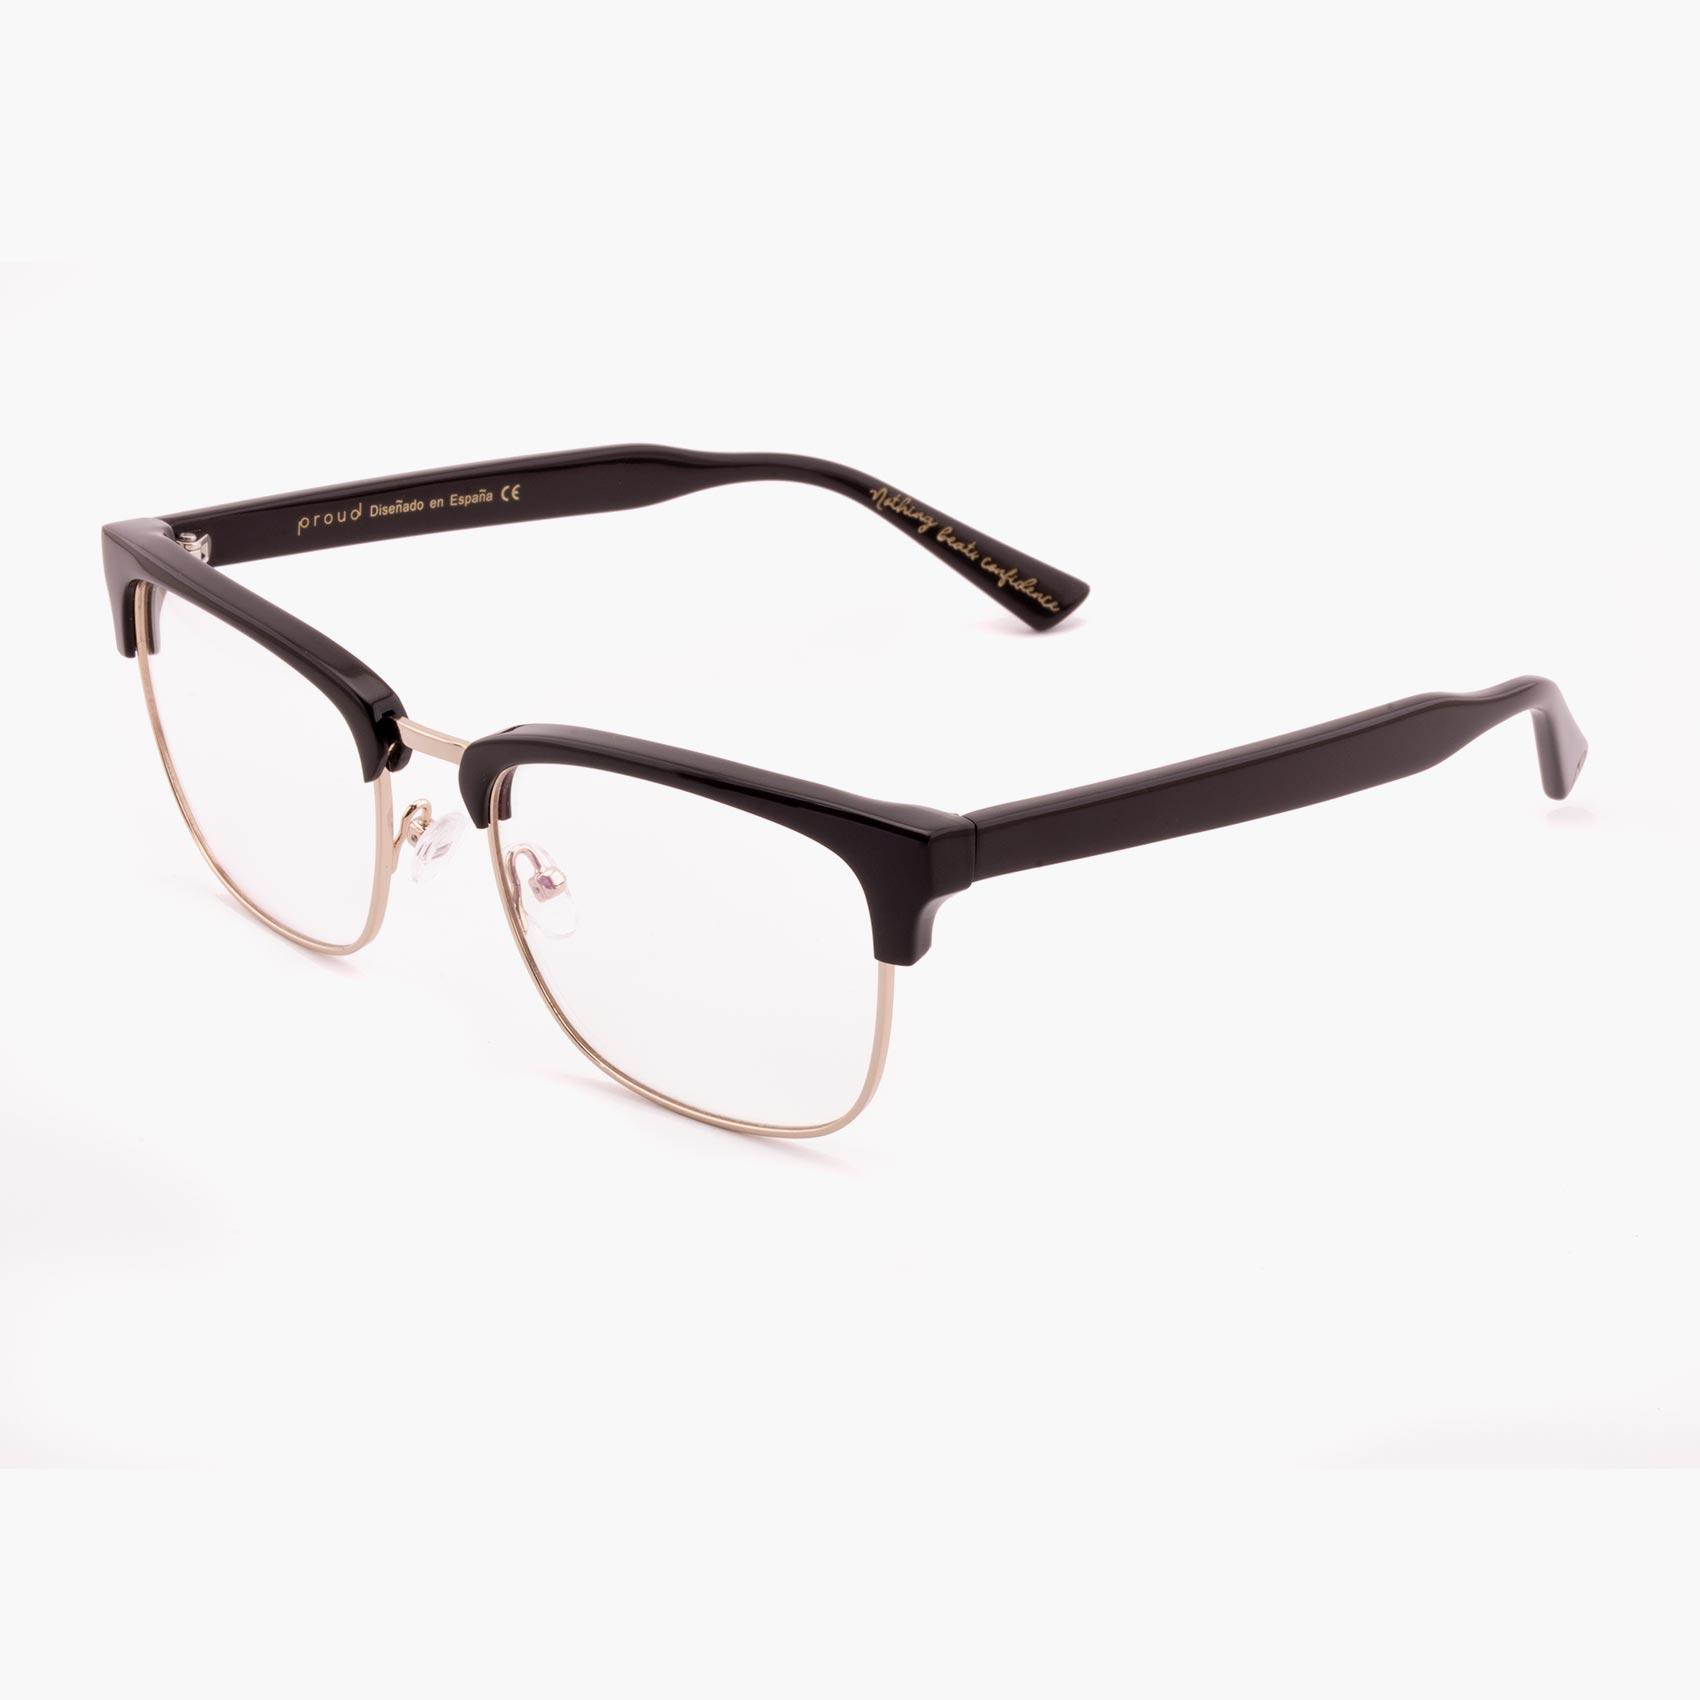 Proud eyewear Hopkins C2 P clubmaster glasses black